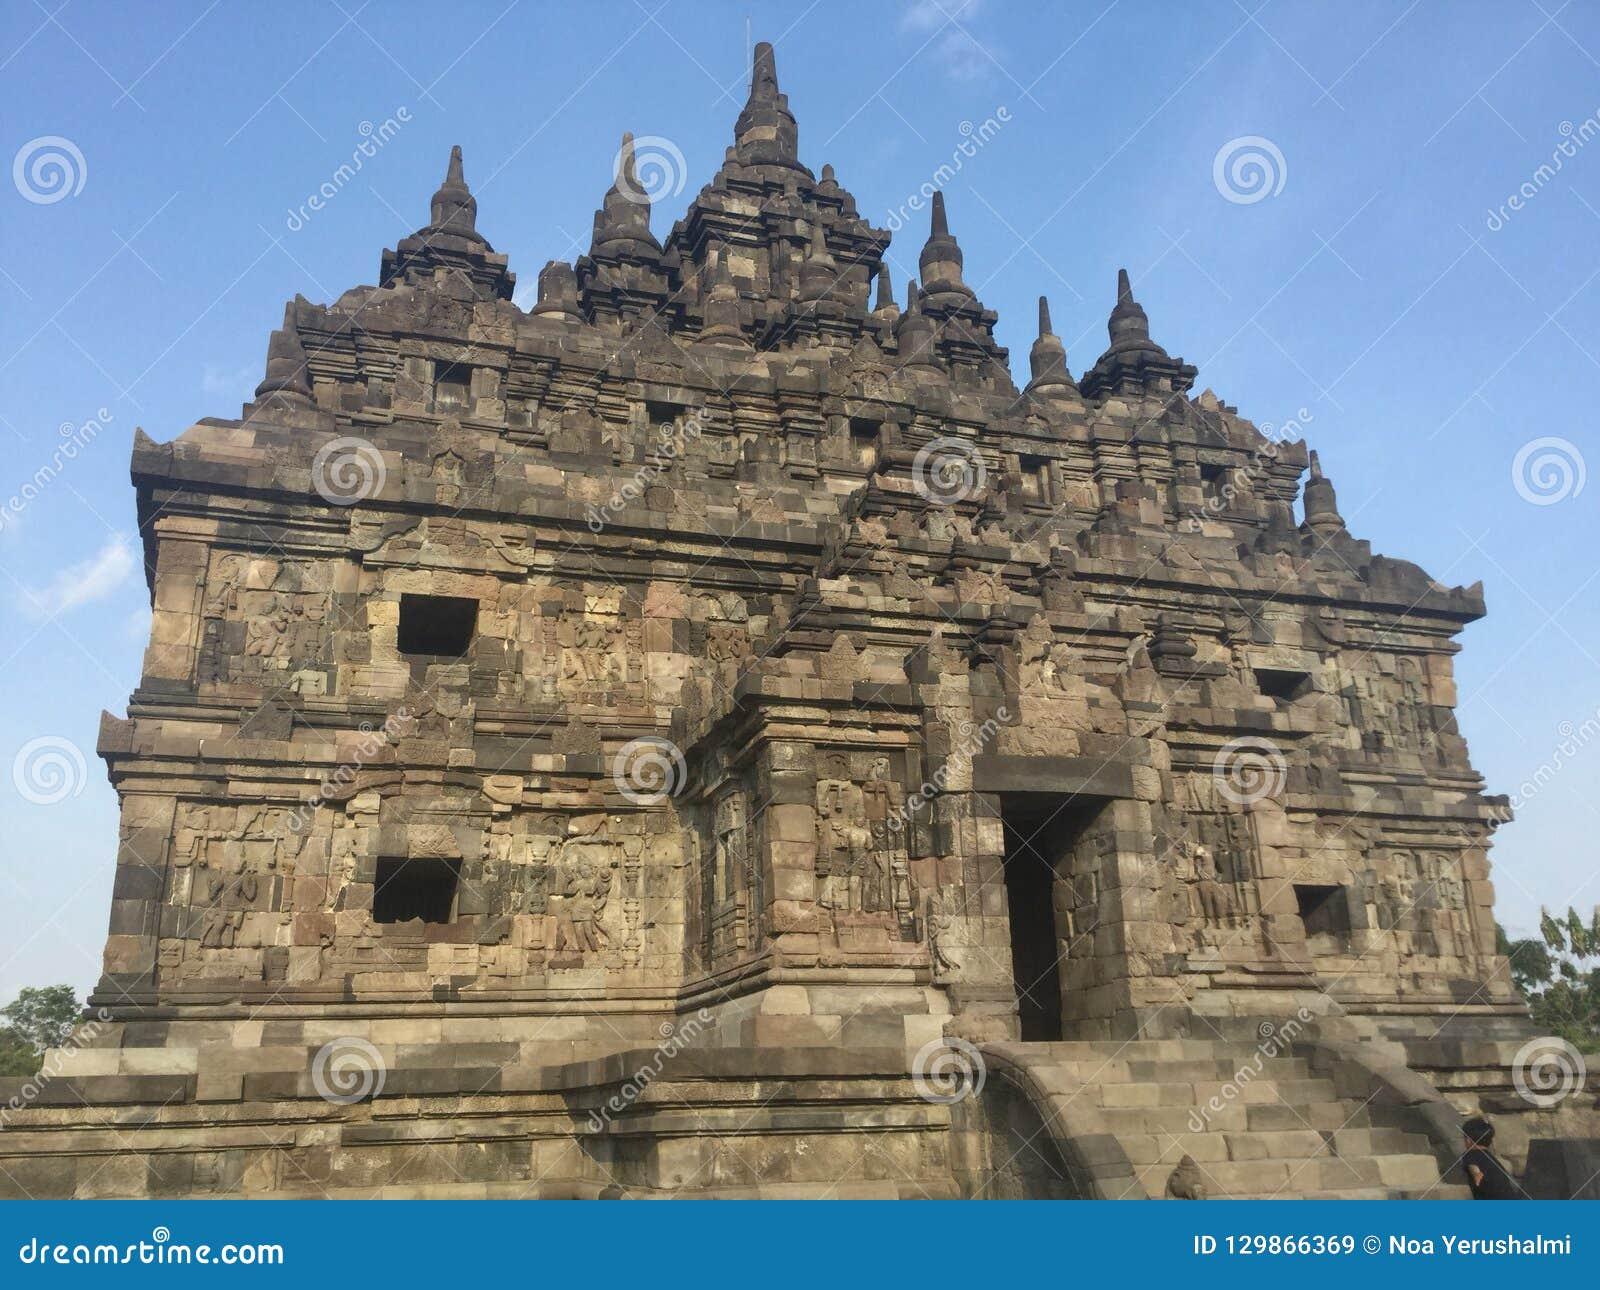 Templo budista de Plaosan Ruínas históricas Arquitetura antiga indonésia